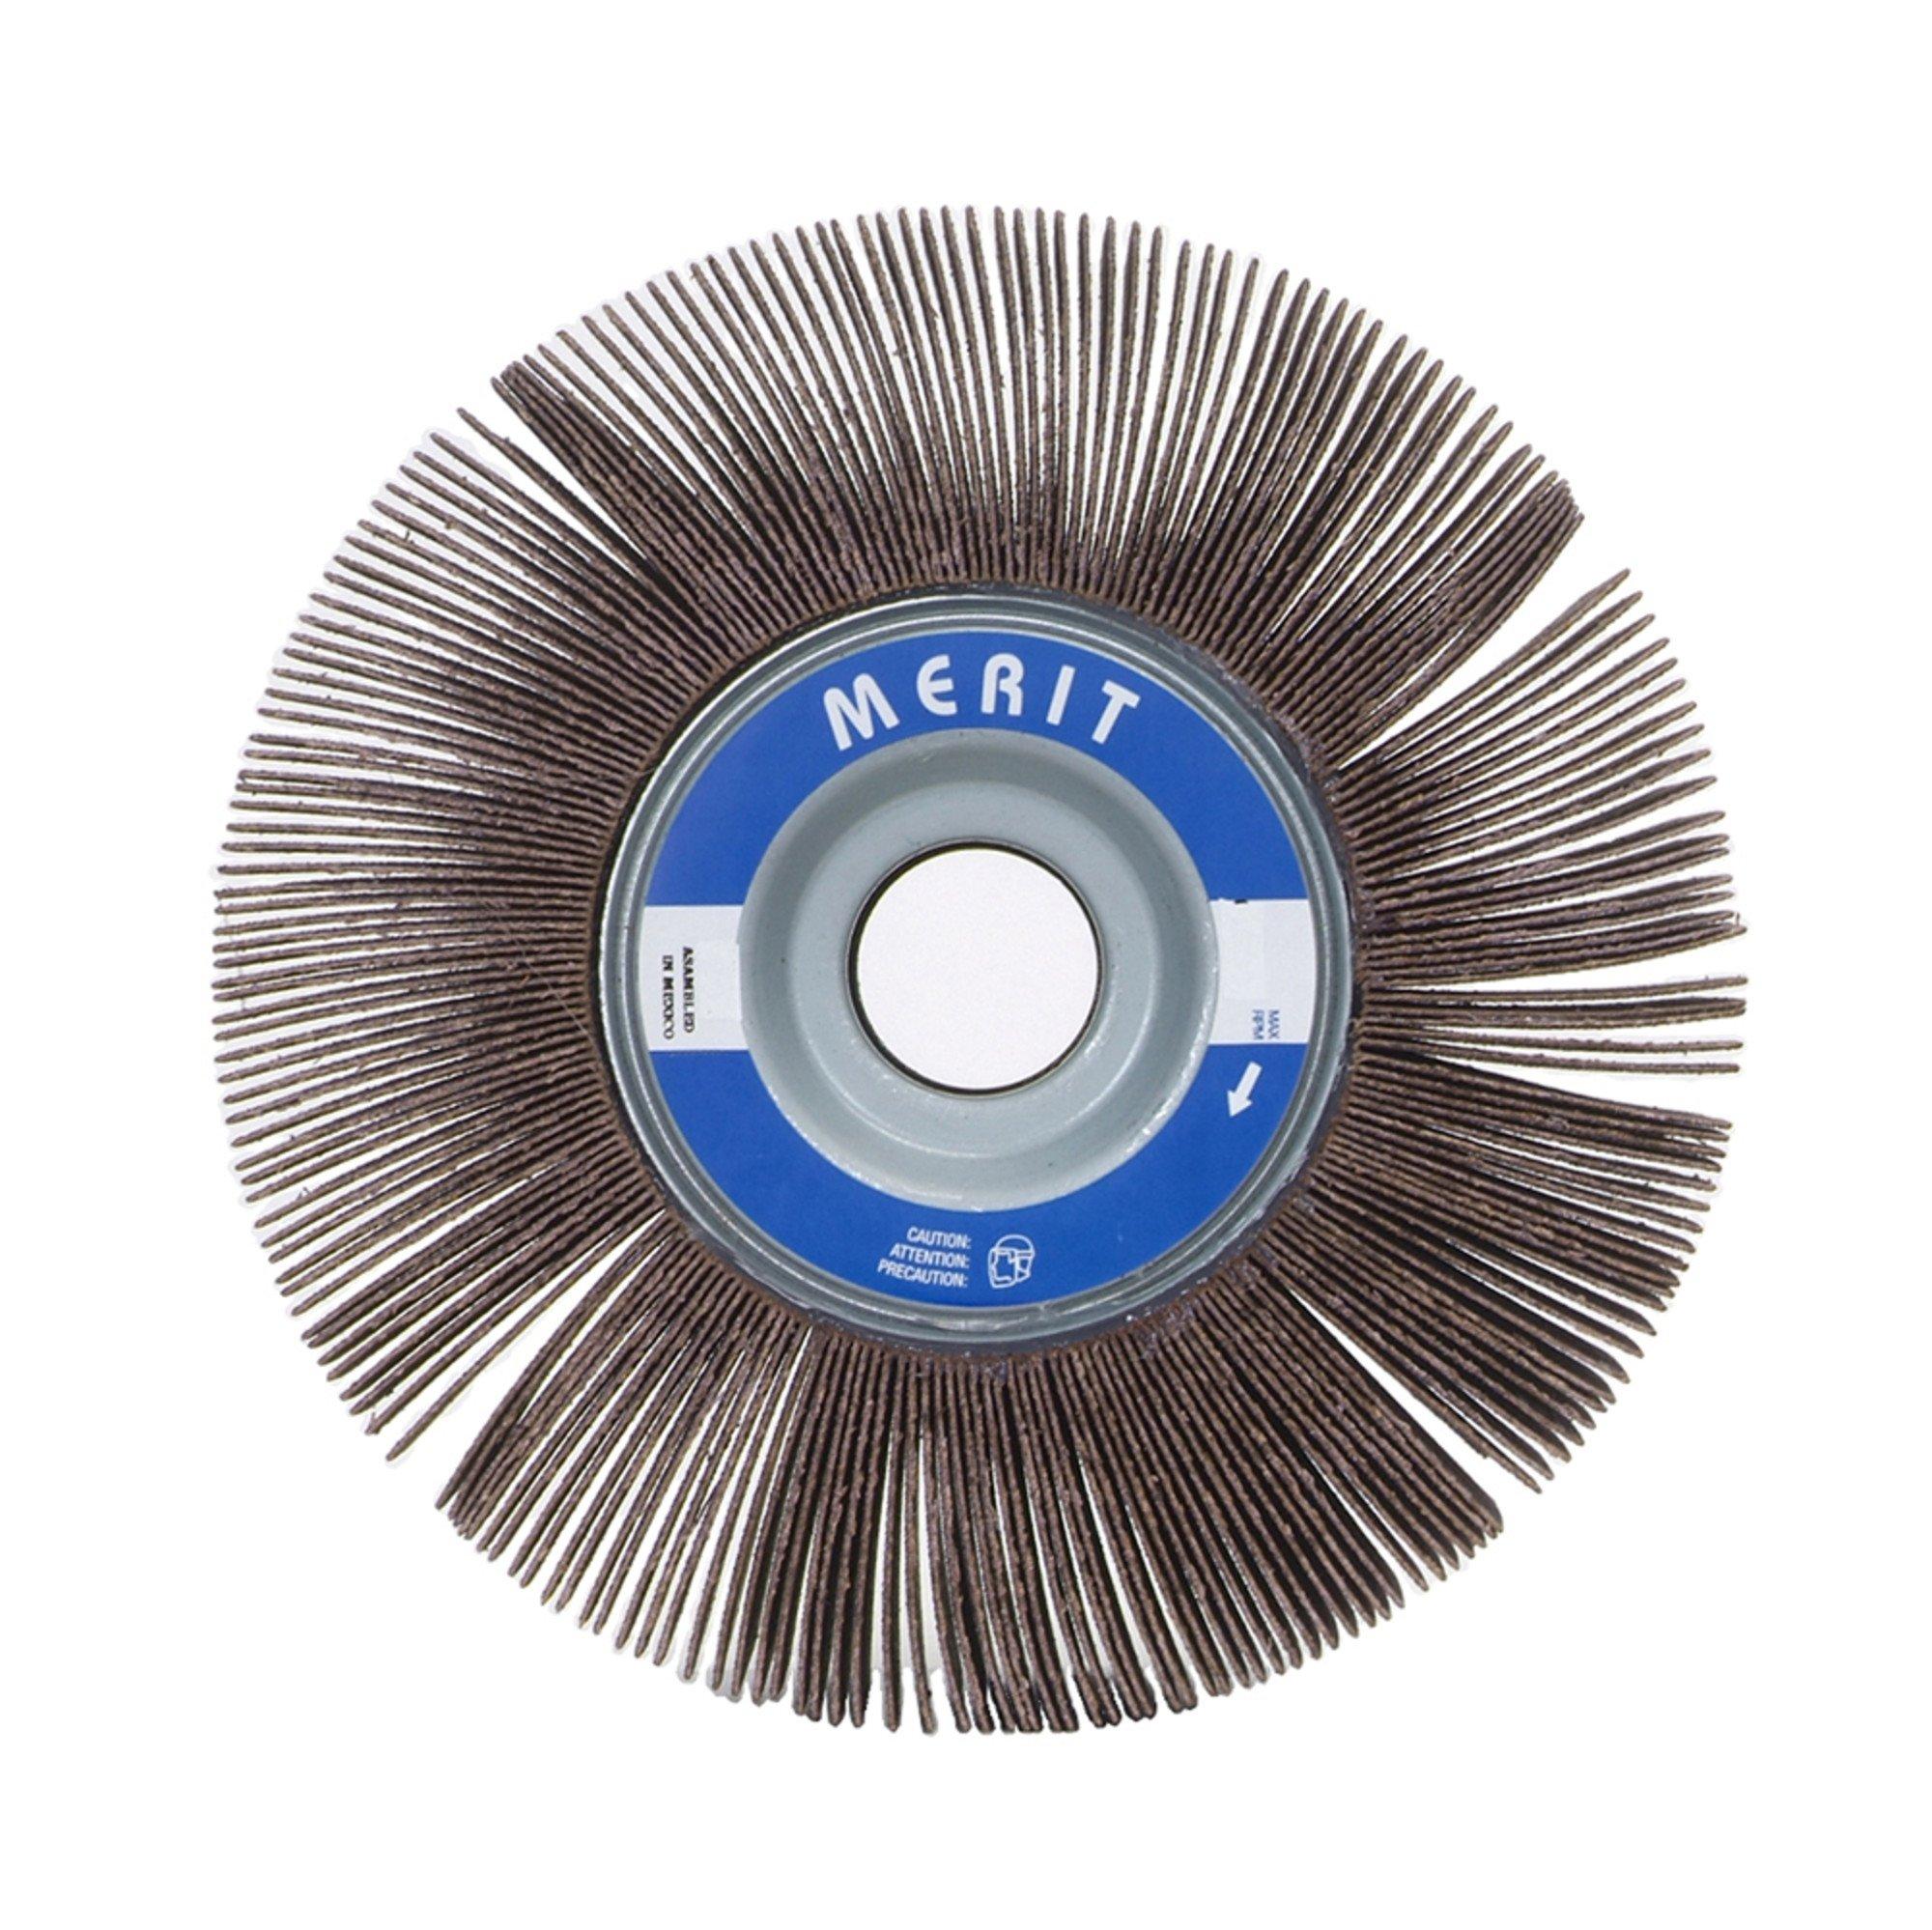 Merit Grind-O-Flex Abrasive Flap Wheel, 1'' Arbor, Round Hole, Ceramic Aluminum Oxide, 6'' Dia., 1/2'' Face Width, Grit 120, 6000 Max RPM (Pack of 1)